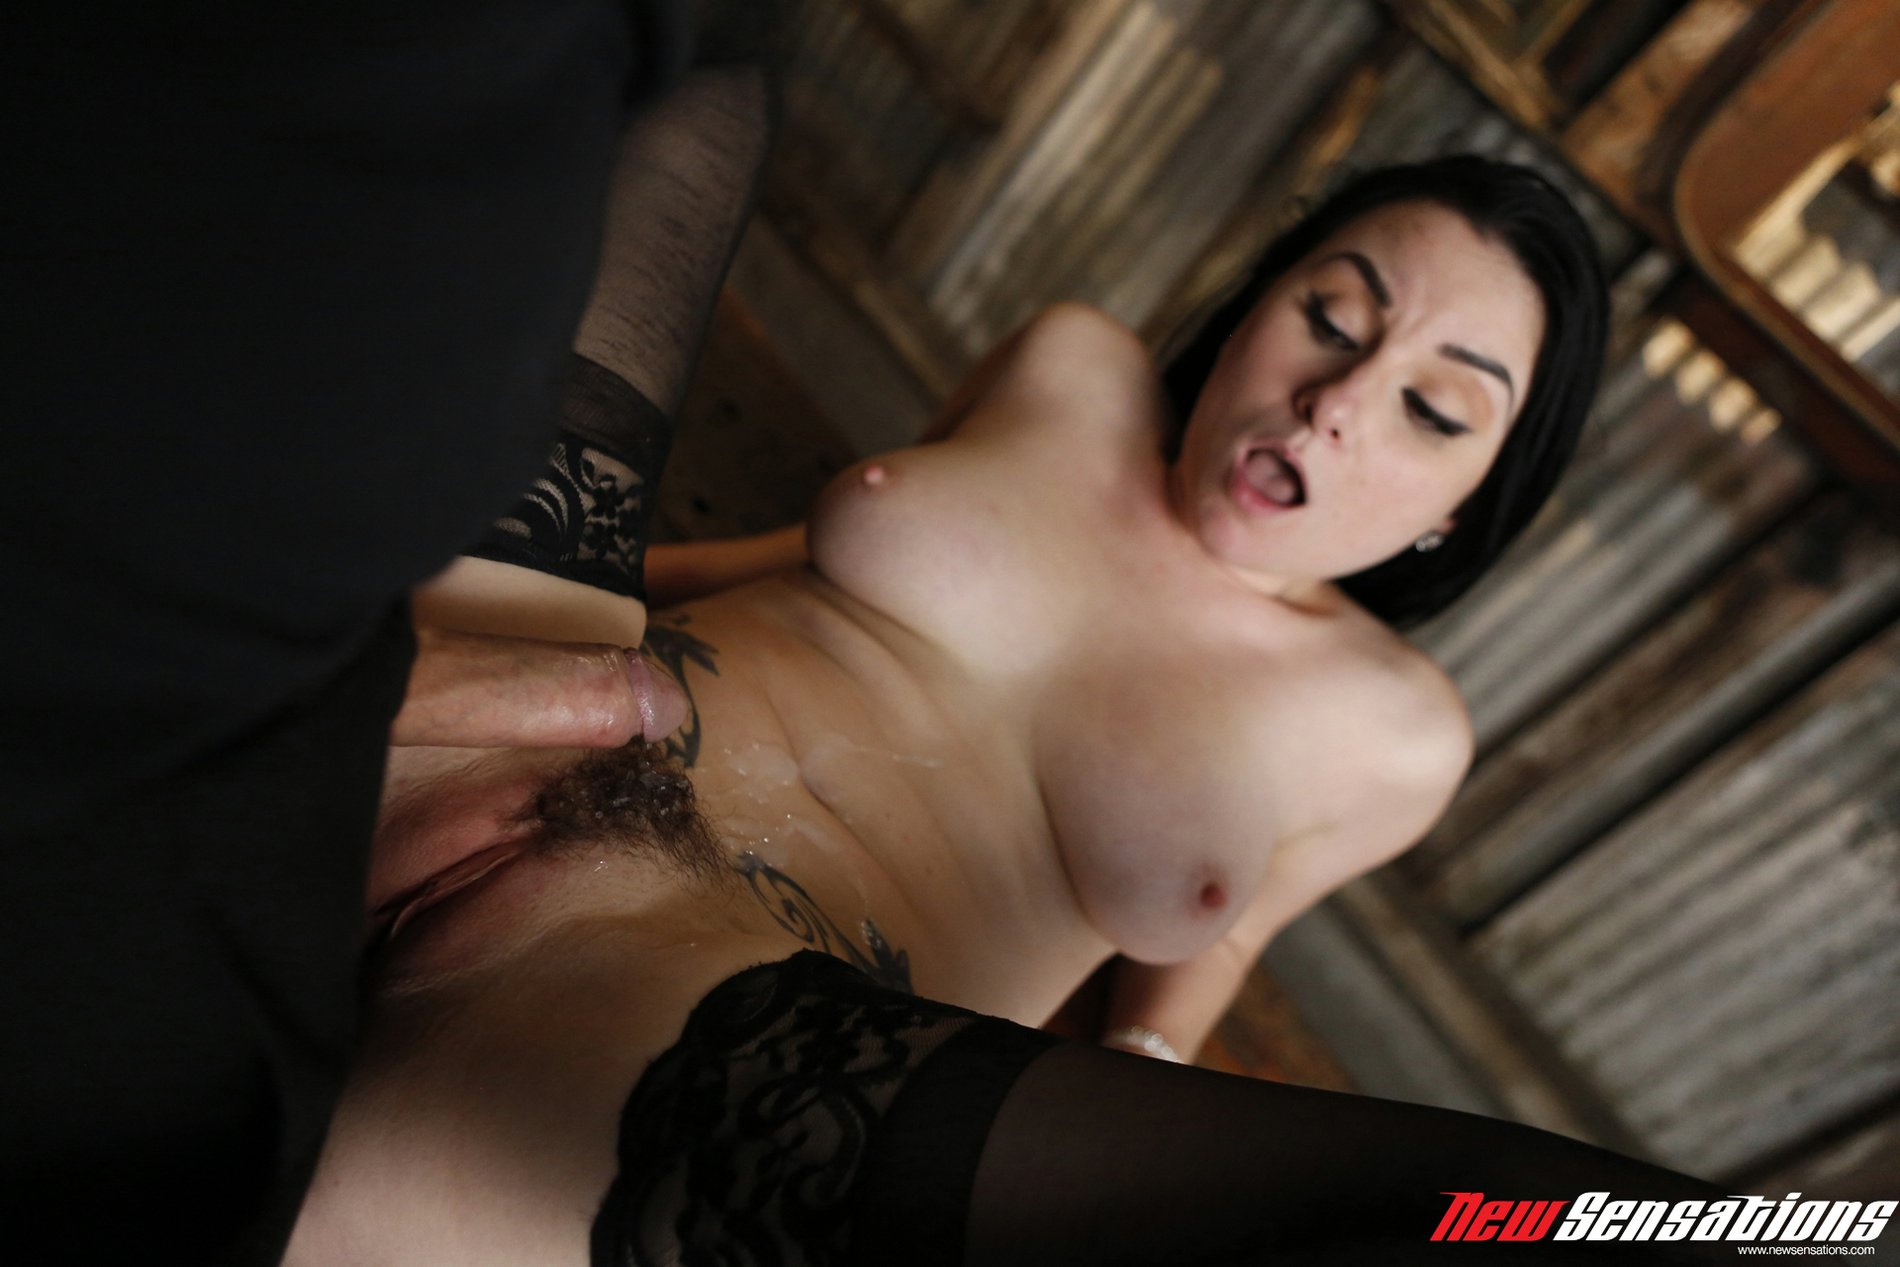 Tied up veruca james enjoys hardcore pleasures 3